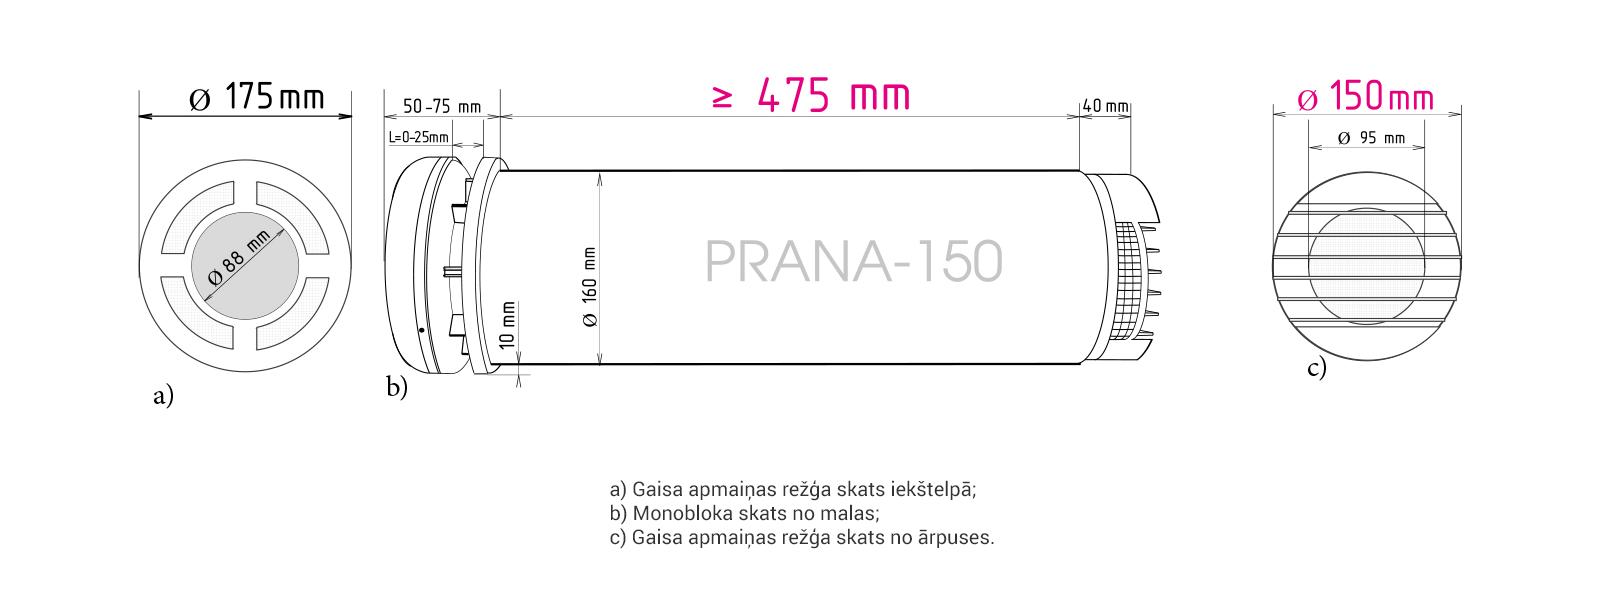 Rekuperatora Prana-150 shēma 2